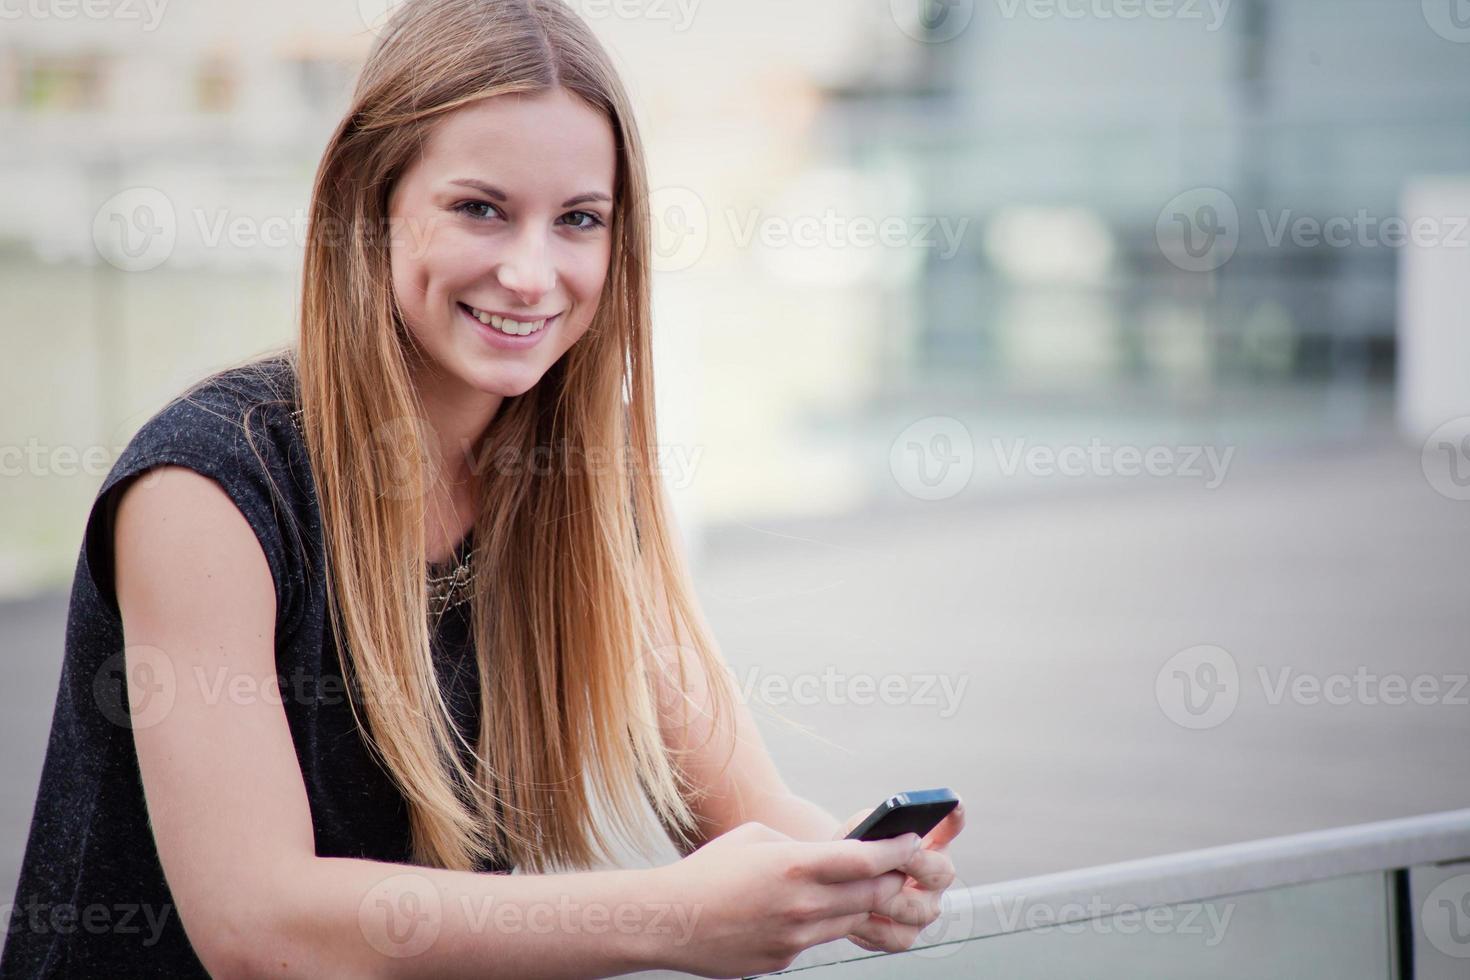 adolescente usando telefone inteligente foto